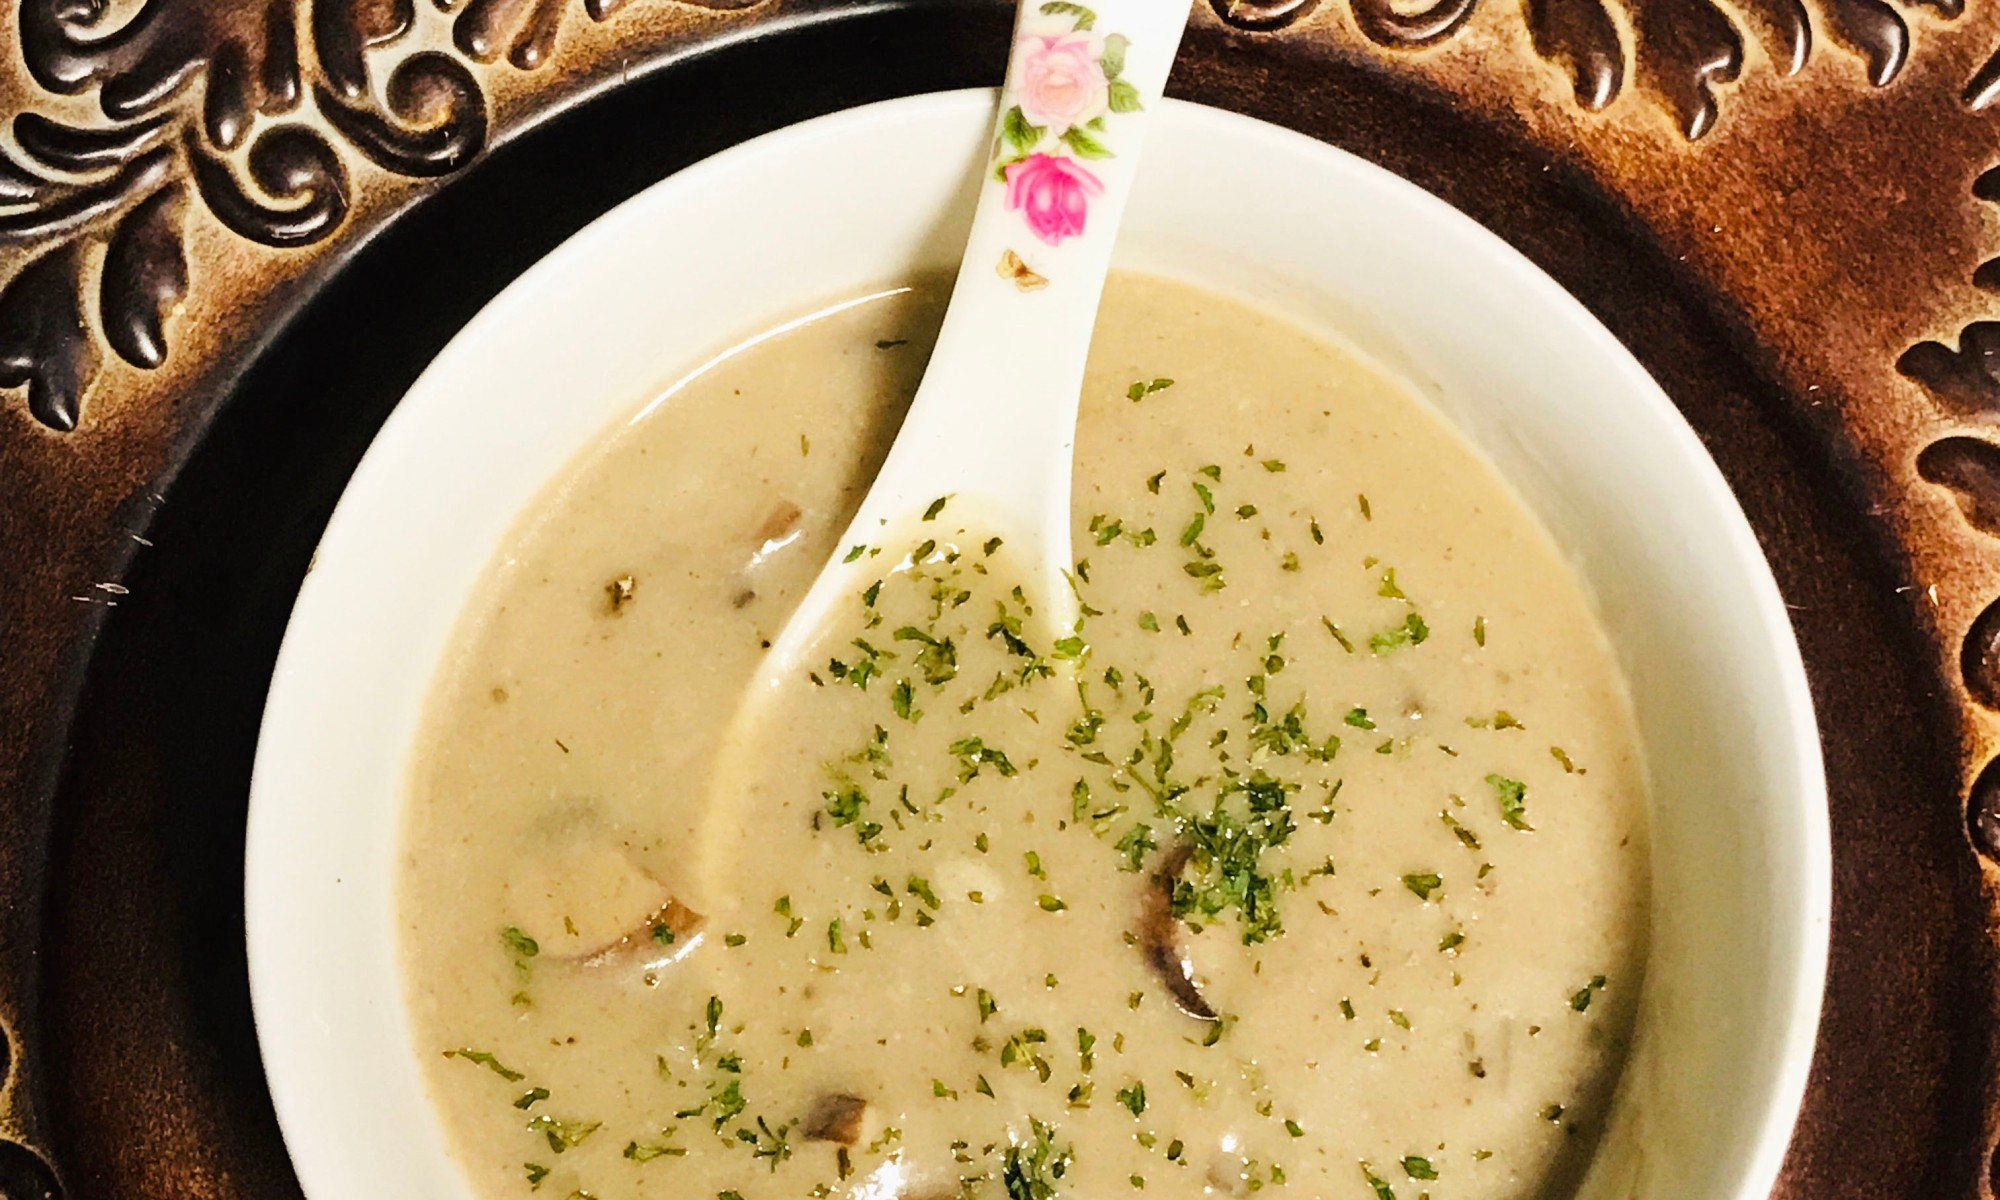 A bowl of vegan cream of mushroom soup